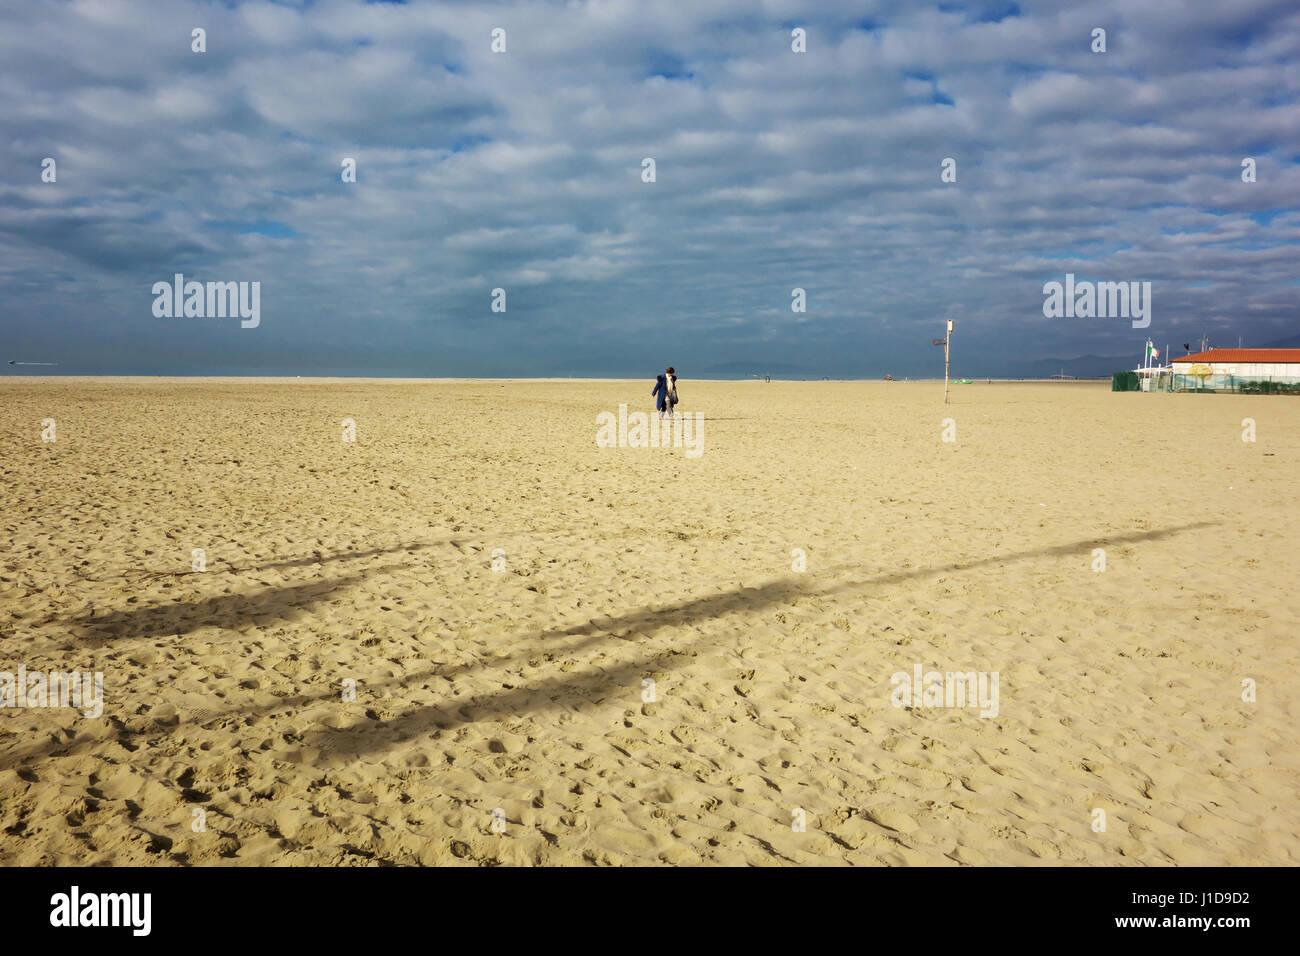 lone-woman-walking-on-a-sand-beach-in-wi